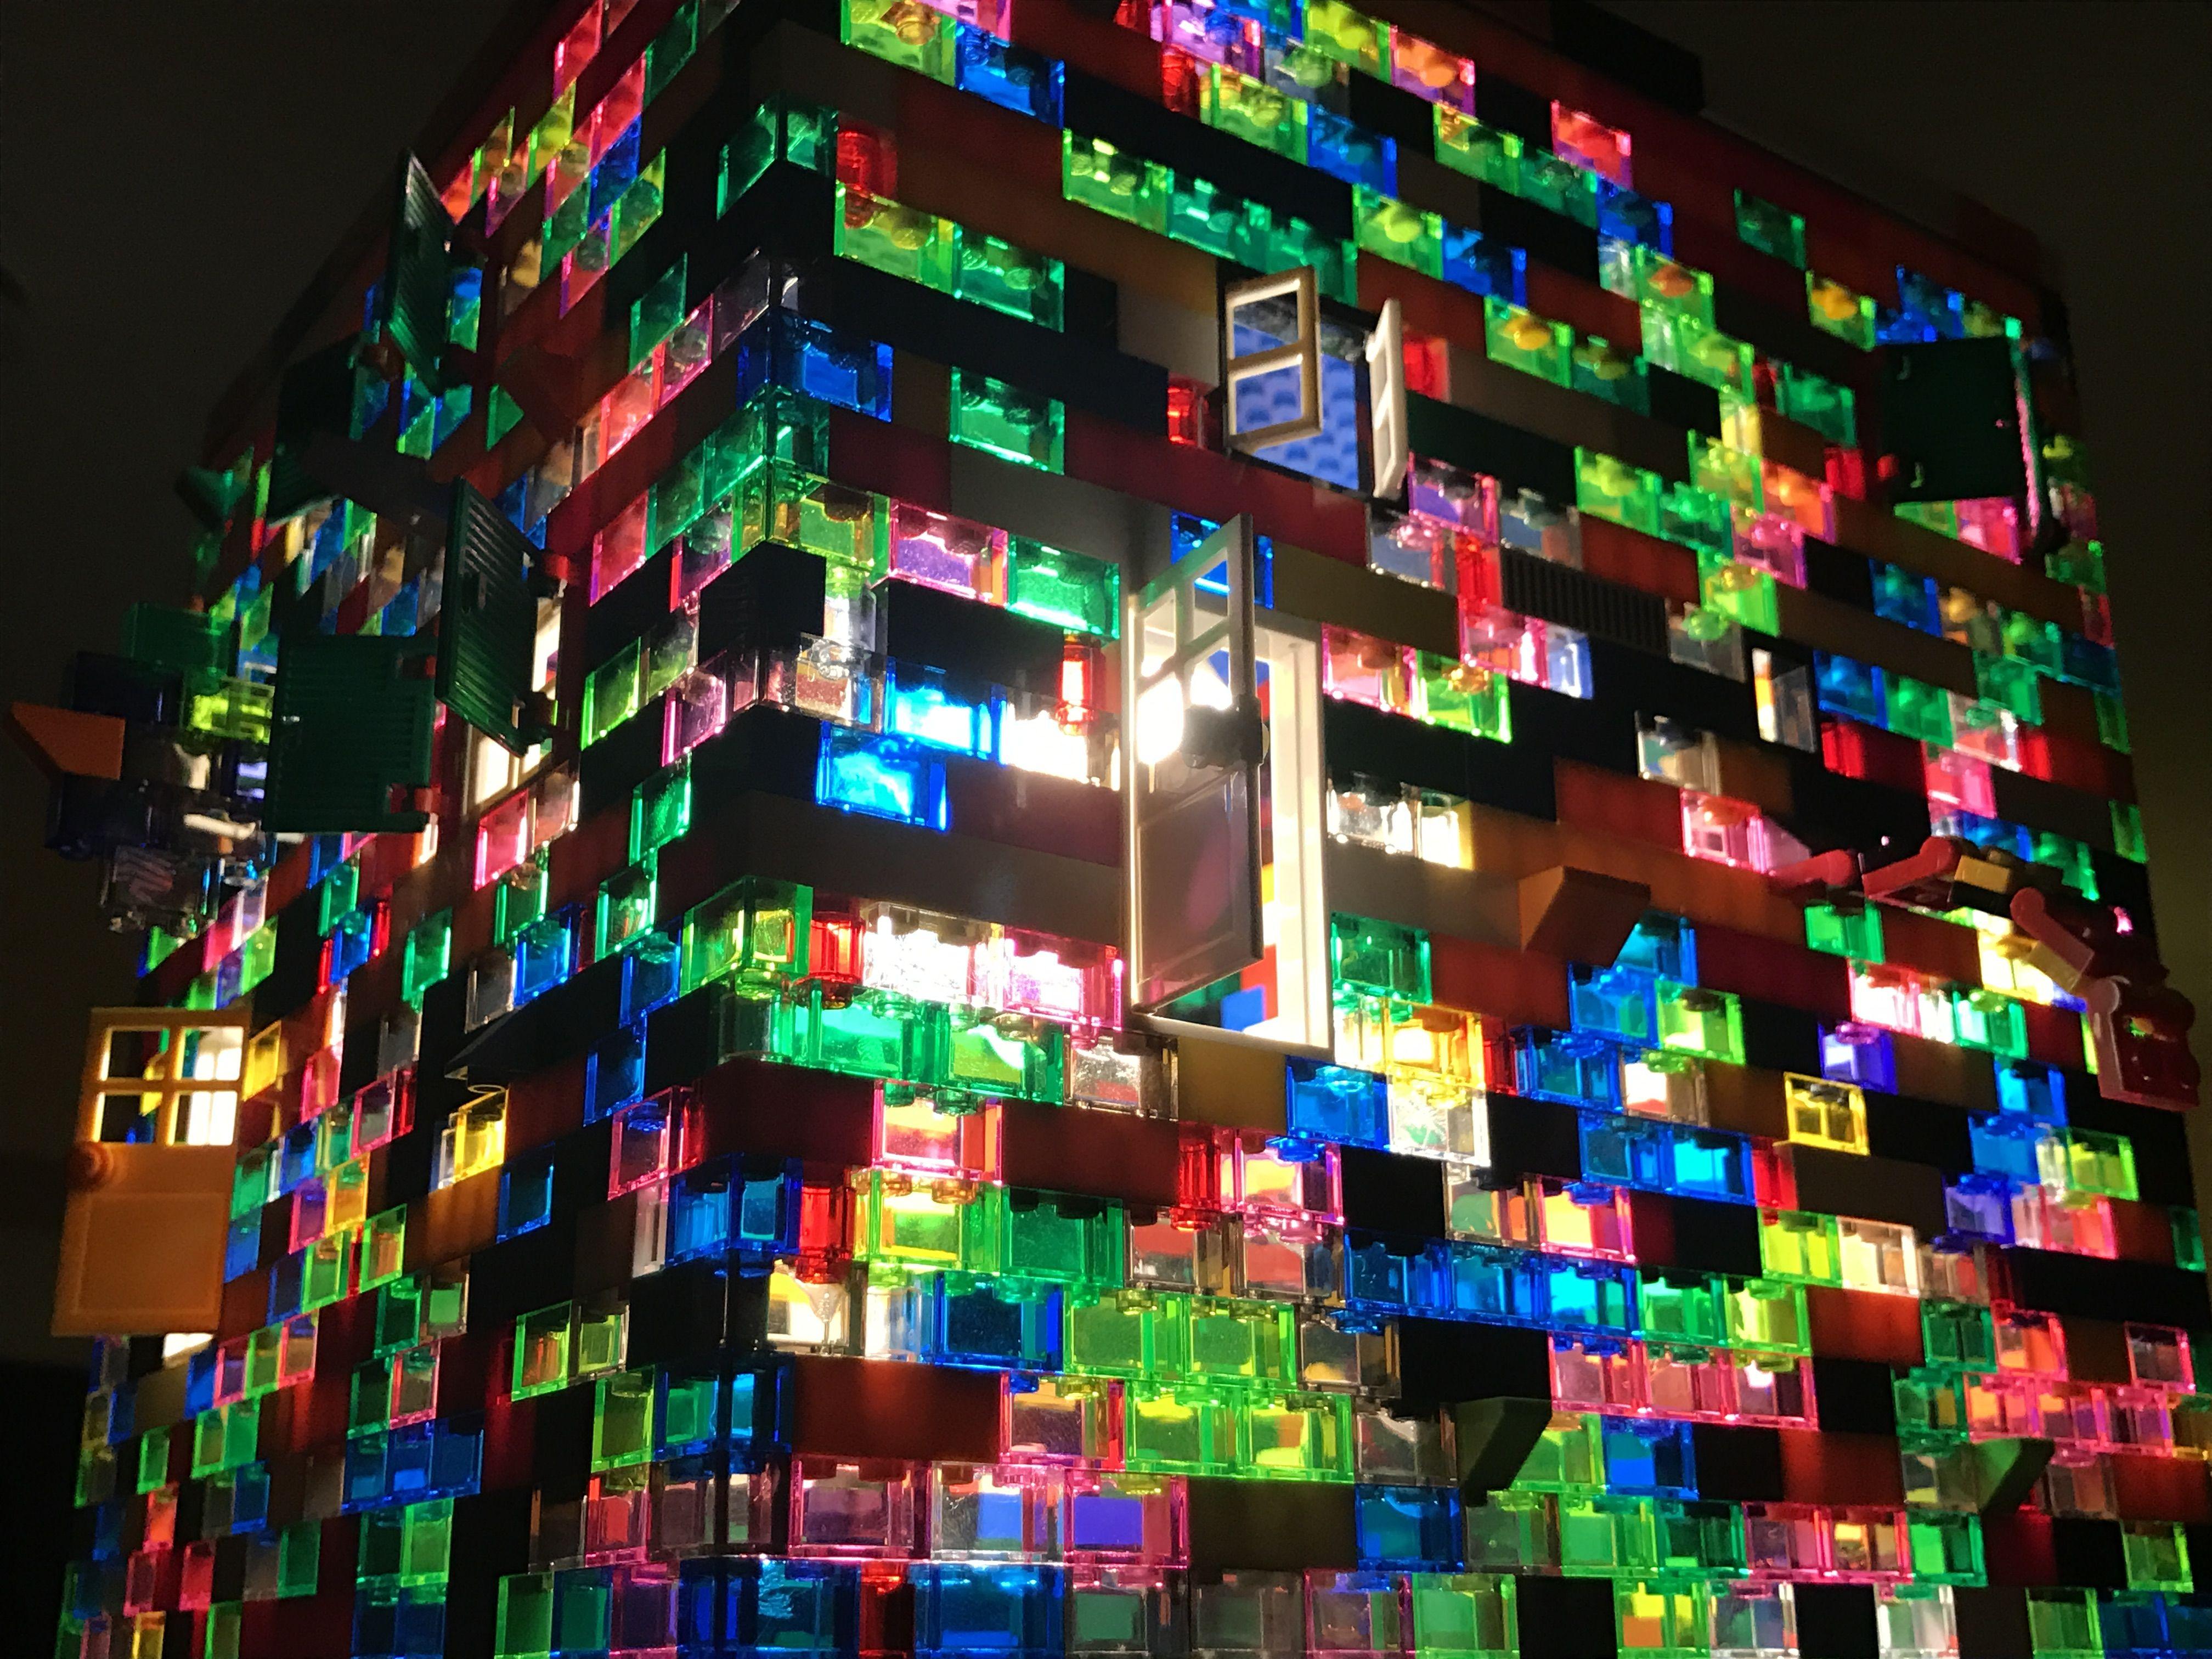 Kinderzimmerlampe junge ~ Lego lampe lego leuchte lego leuchte lego lampe lego lamp